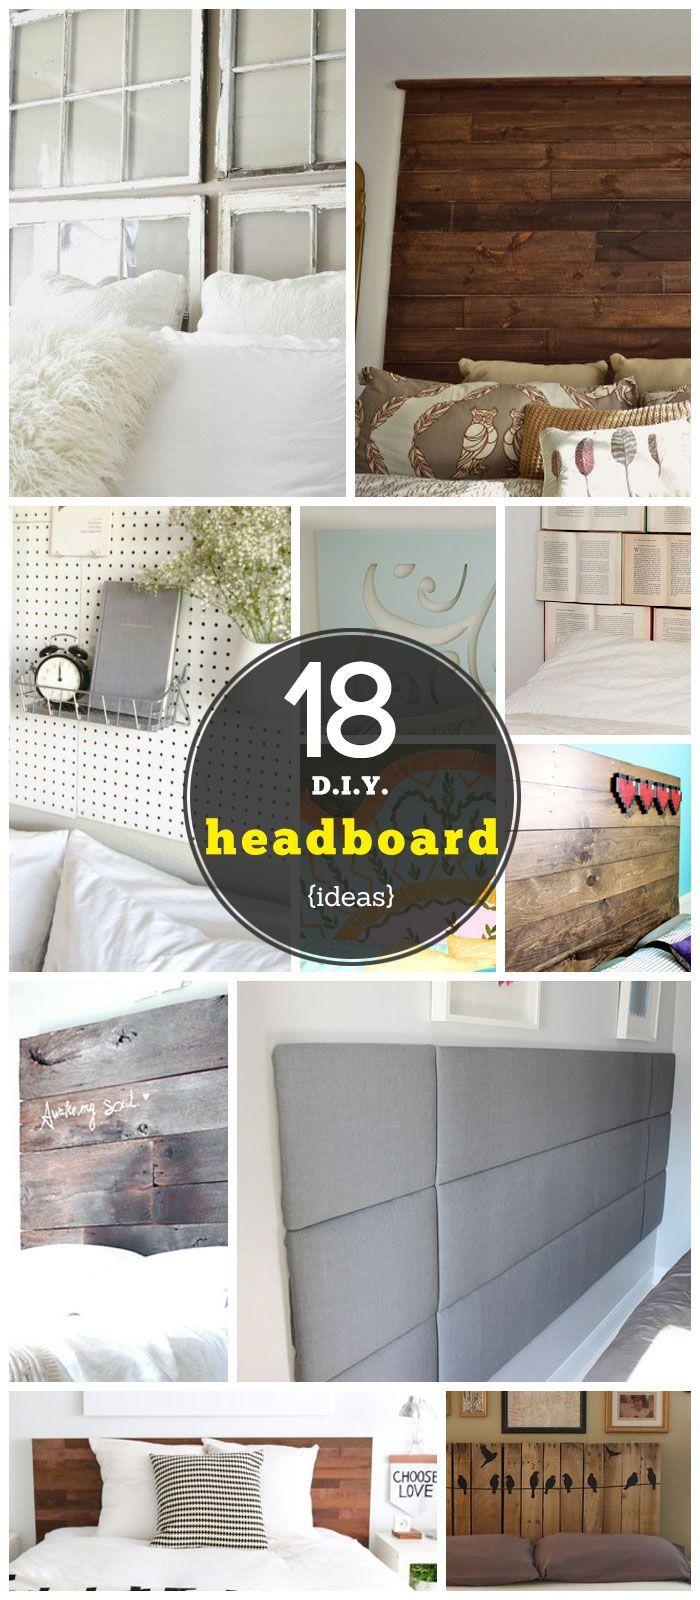 Diy bedroom headboard ideas click for  diy headboard ideas  diy bedroom decor ideas on a